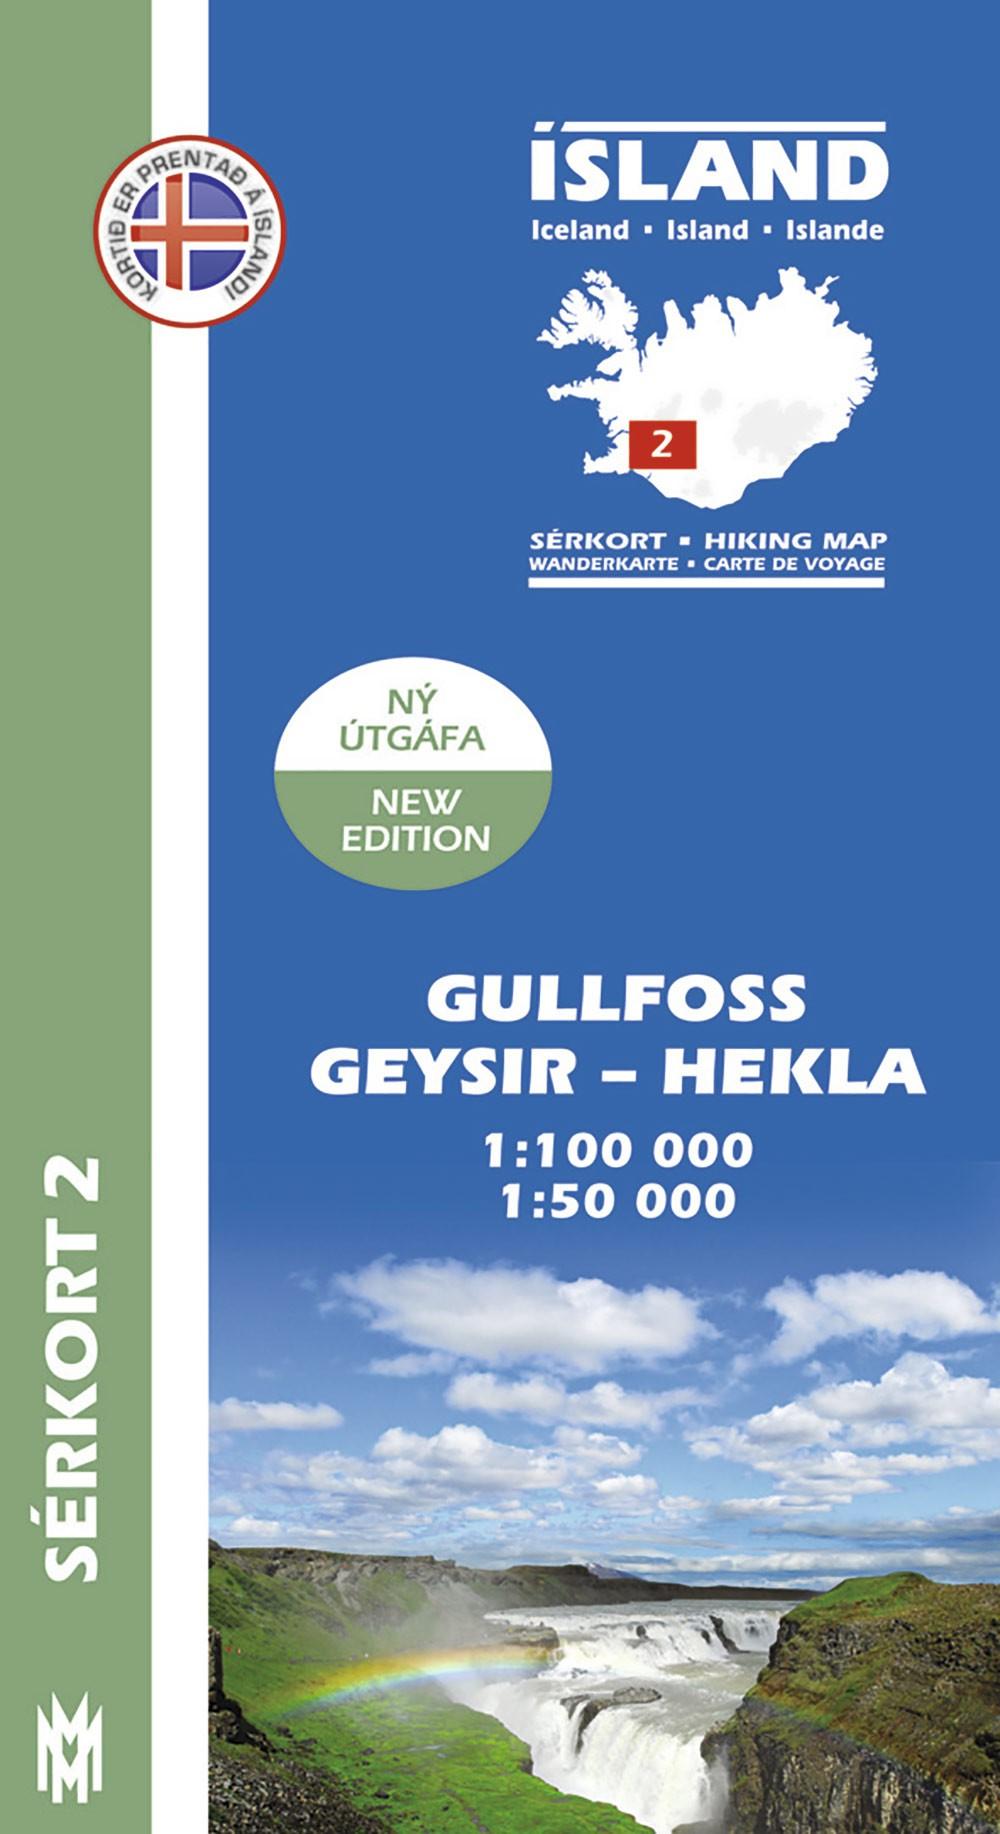 Gullfoss, Geysir, Hekla 1:100 000 – Sérkort 2